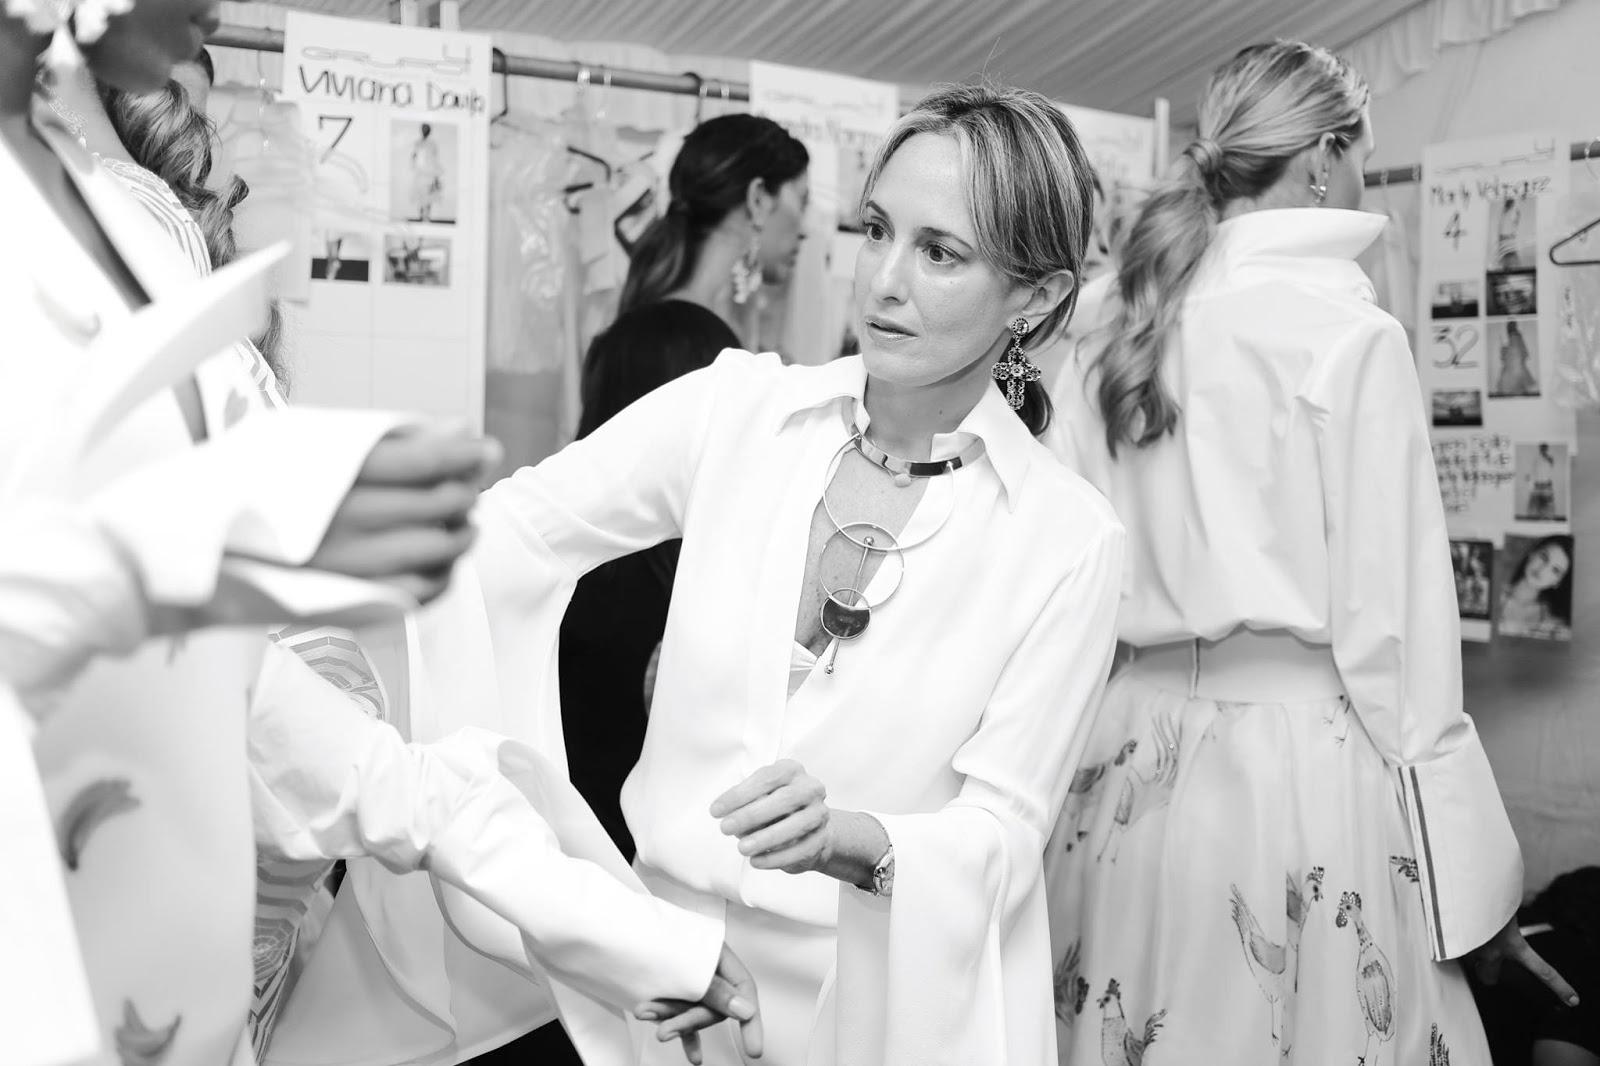 silvia tcherassi, macondo, las mujeres de macondo, gabriel garcia marquez, homenaje, cali exposhow 2016, cali colombia, moda colombia, alina, fashionblogger